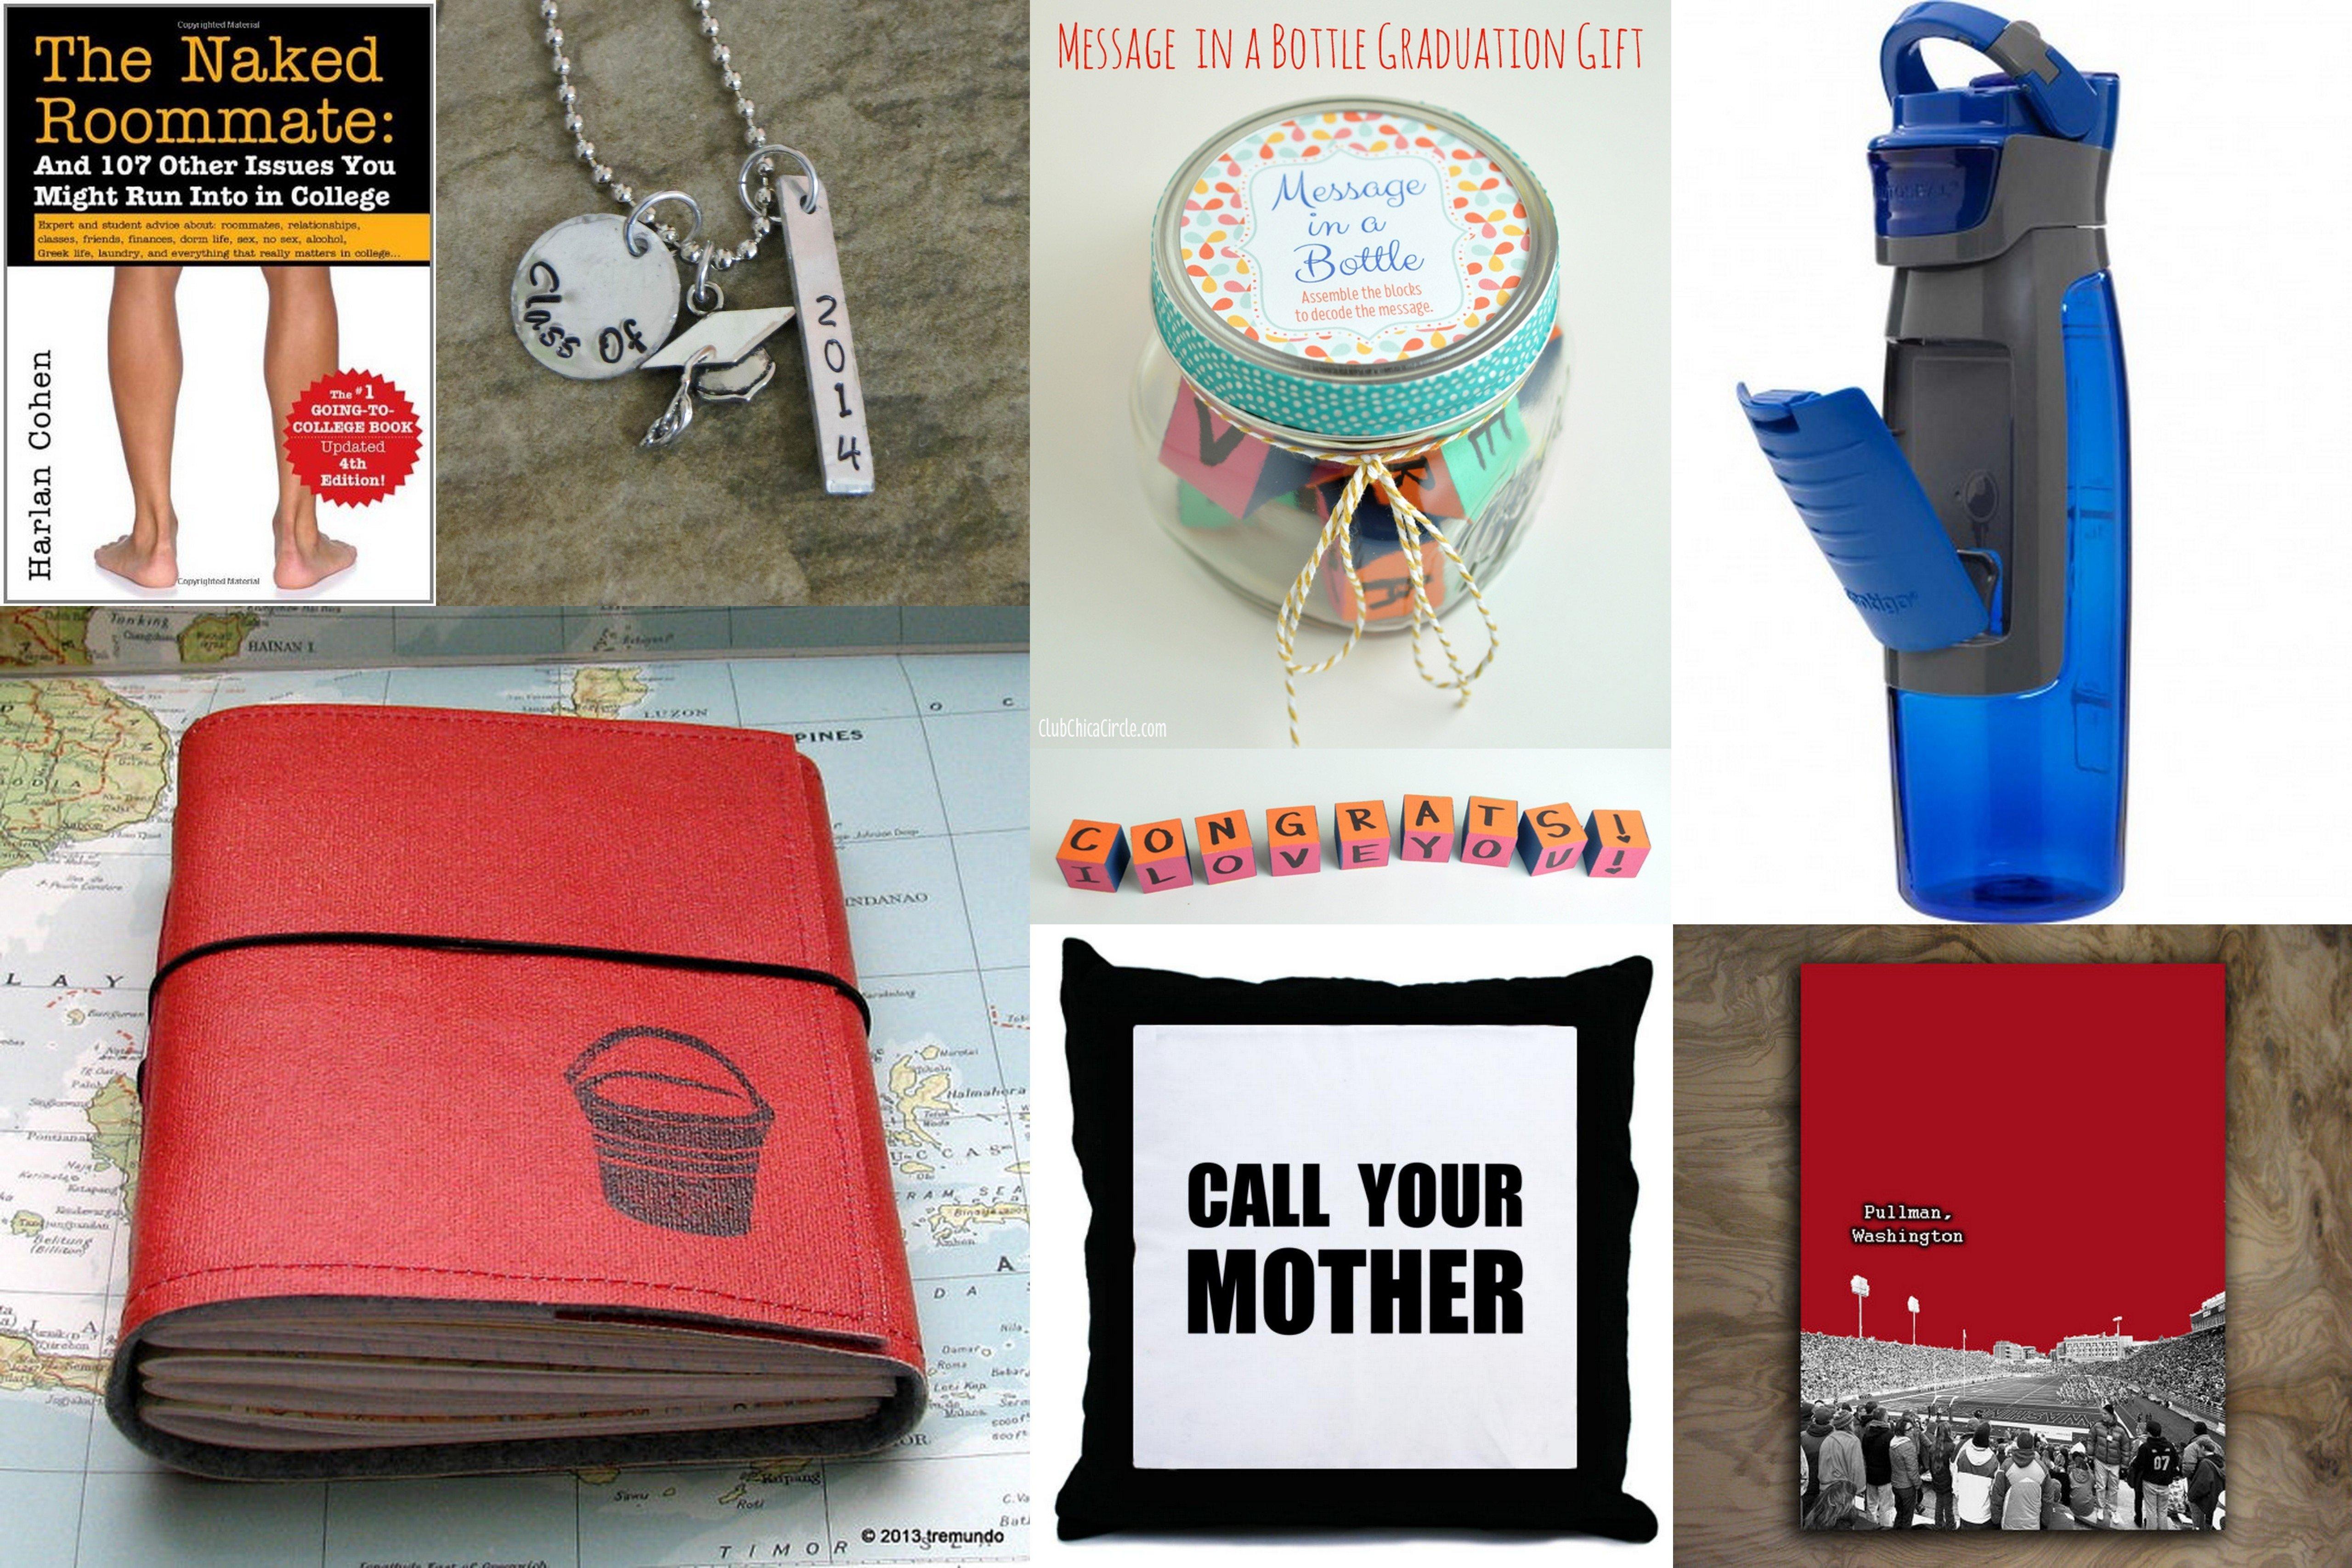 10 Most Popular Creative High School Graduation Gift Ideas 10 unique graduation gifts for 2014 parentmap 8 2020